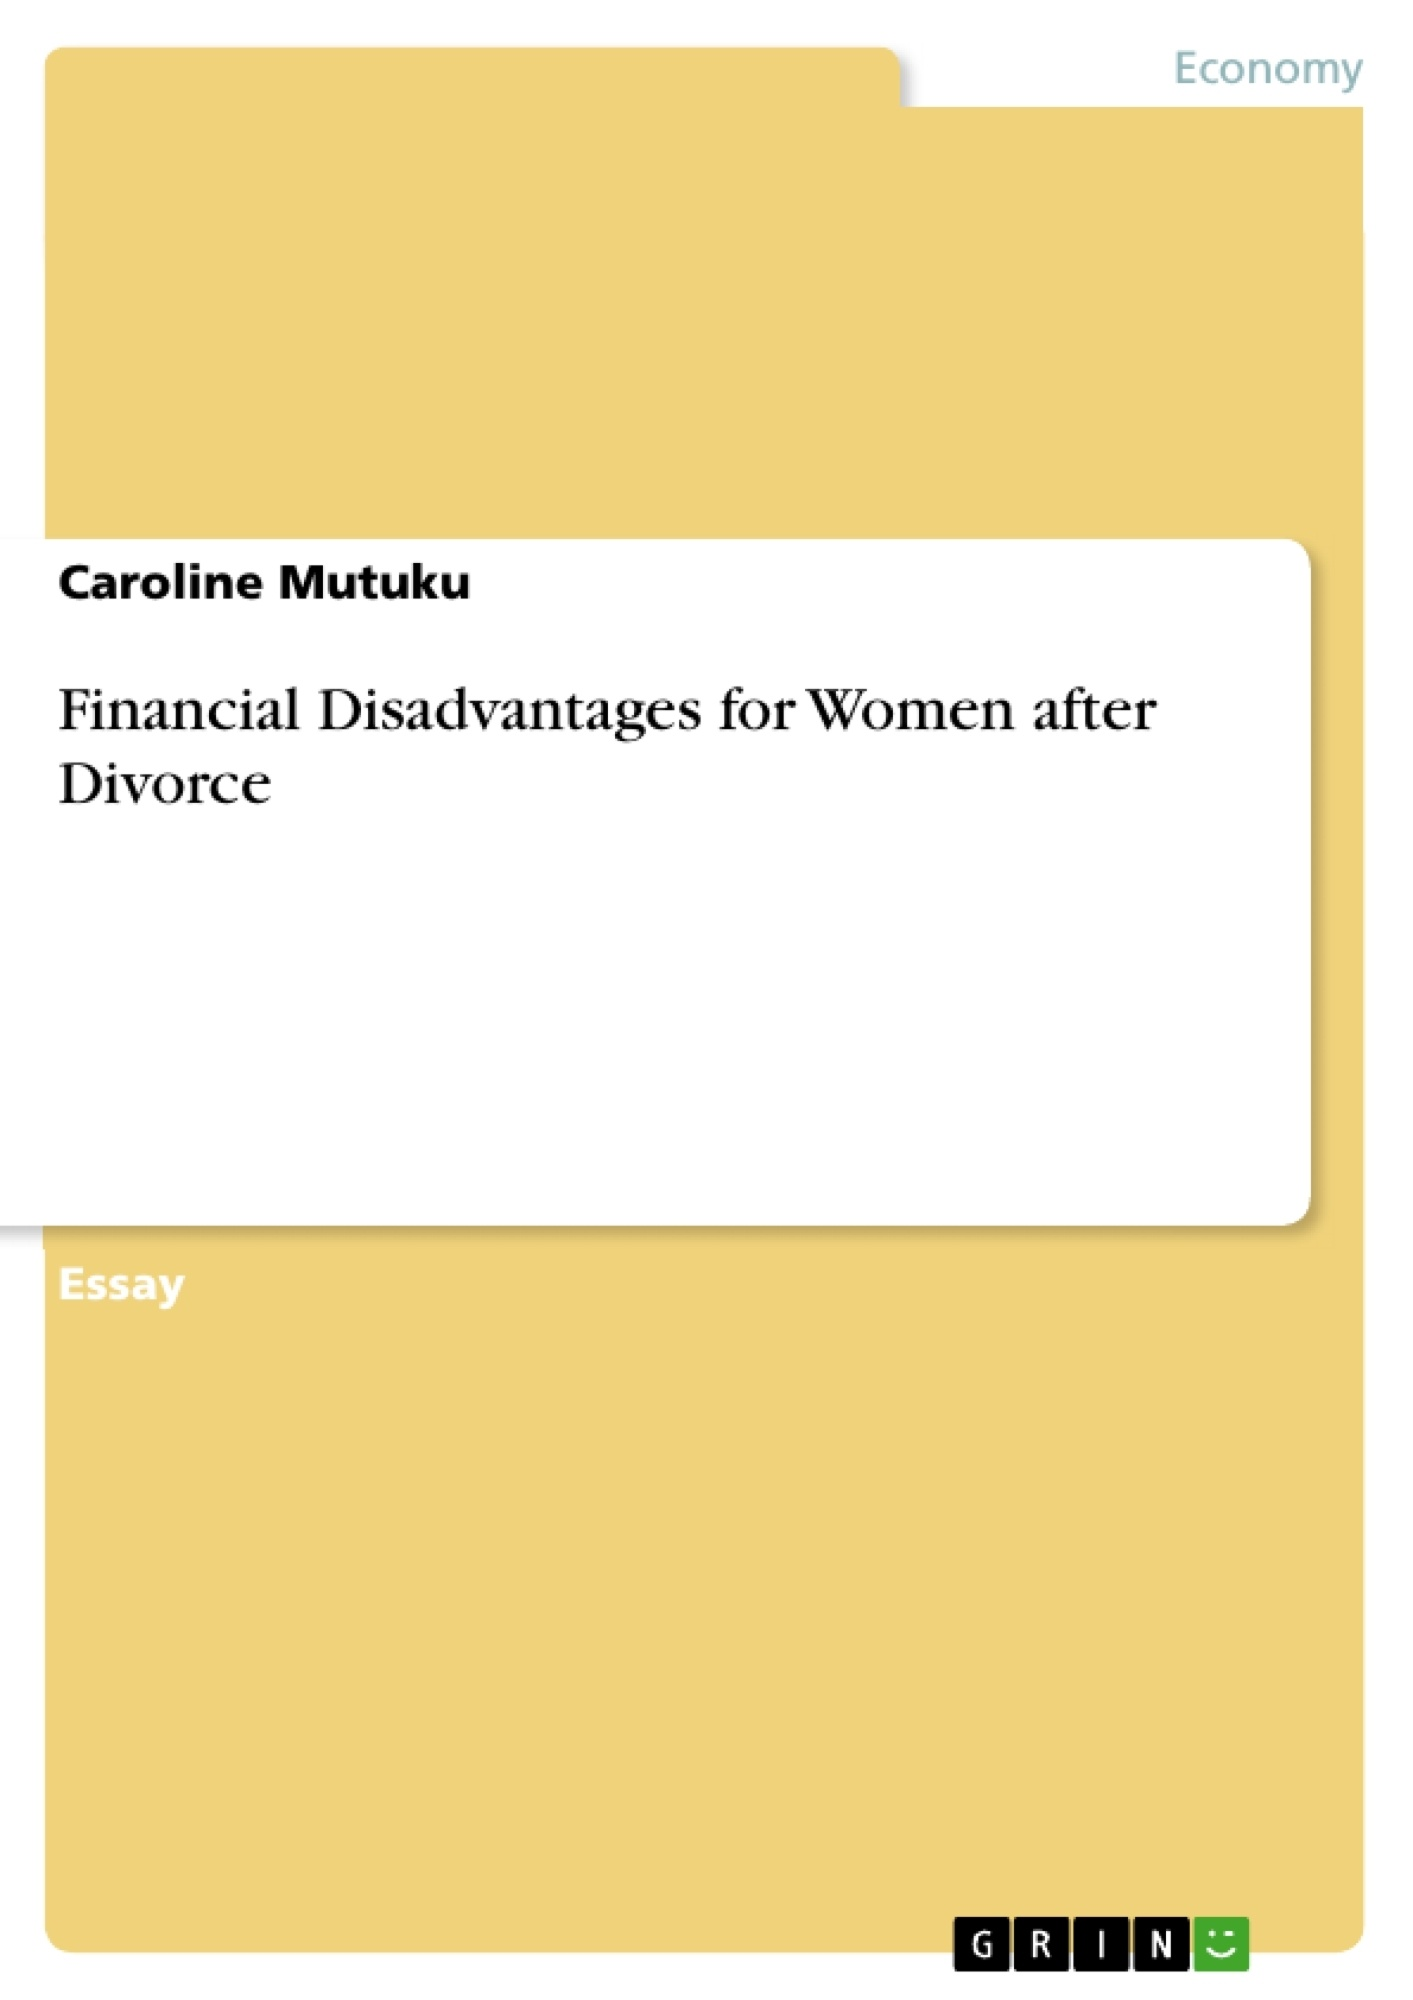 Title: Financial Disadvantages for Women after Divorce